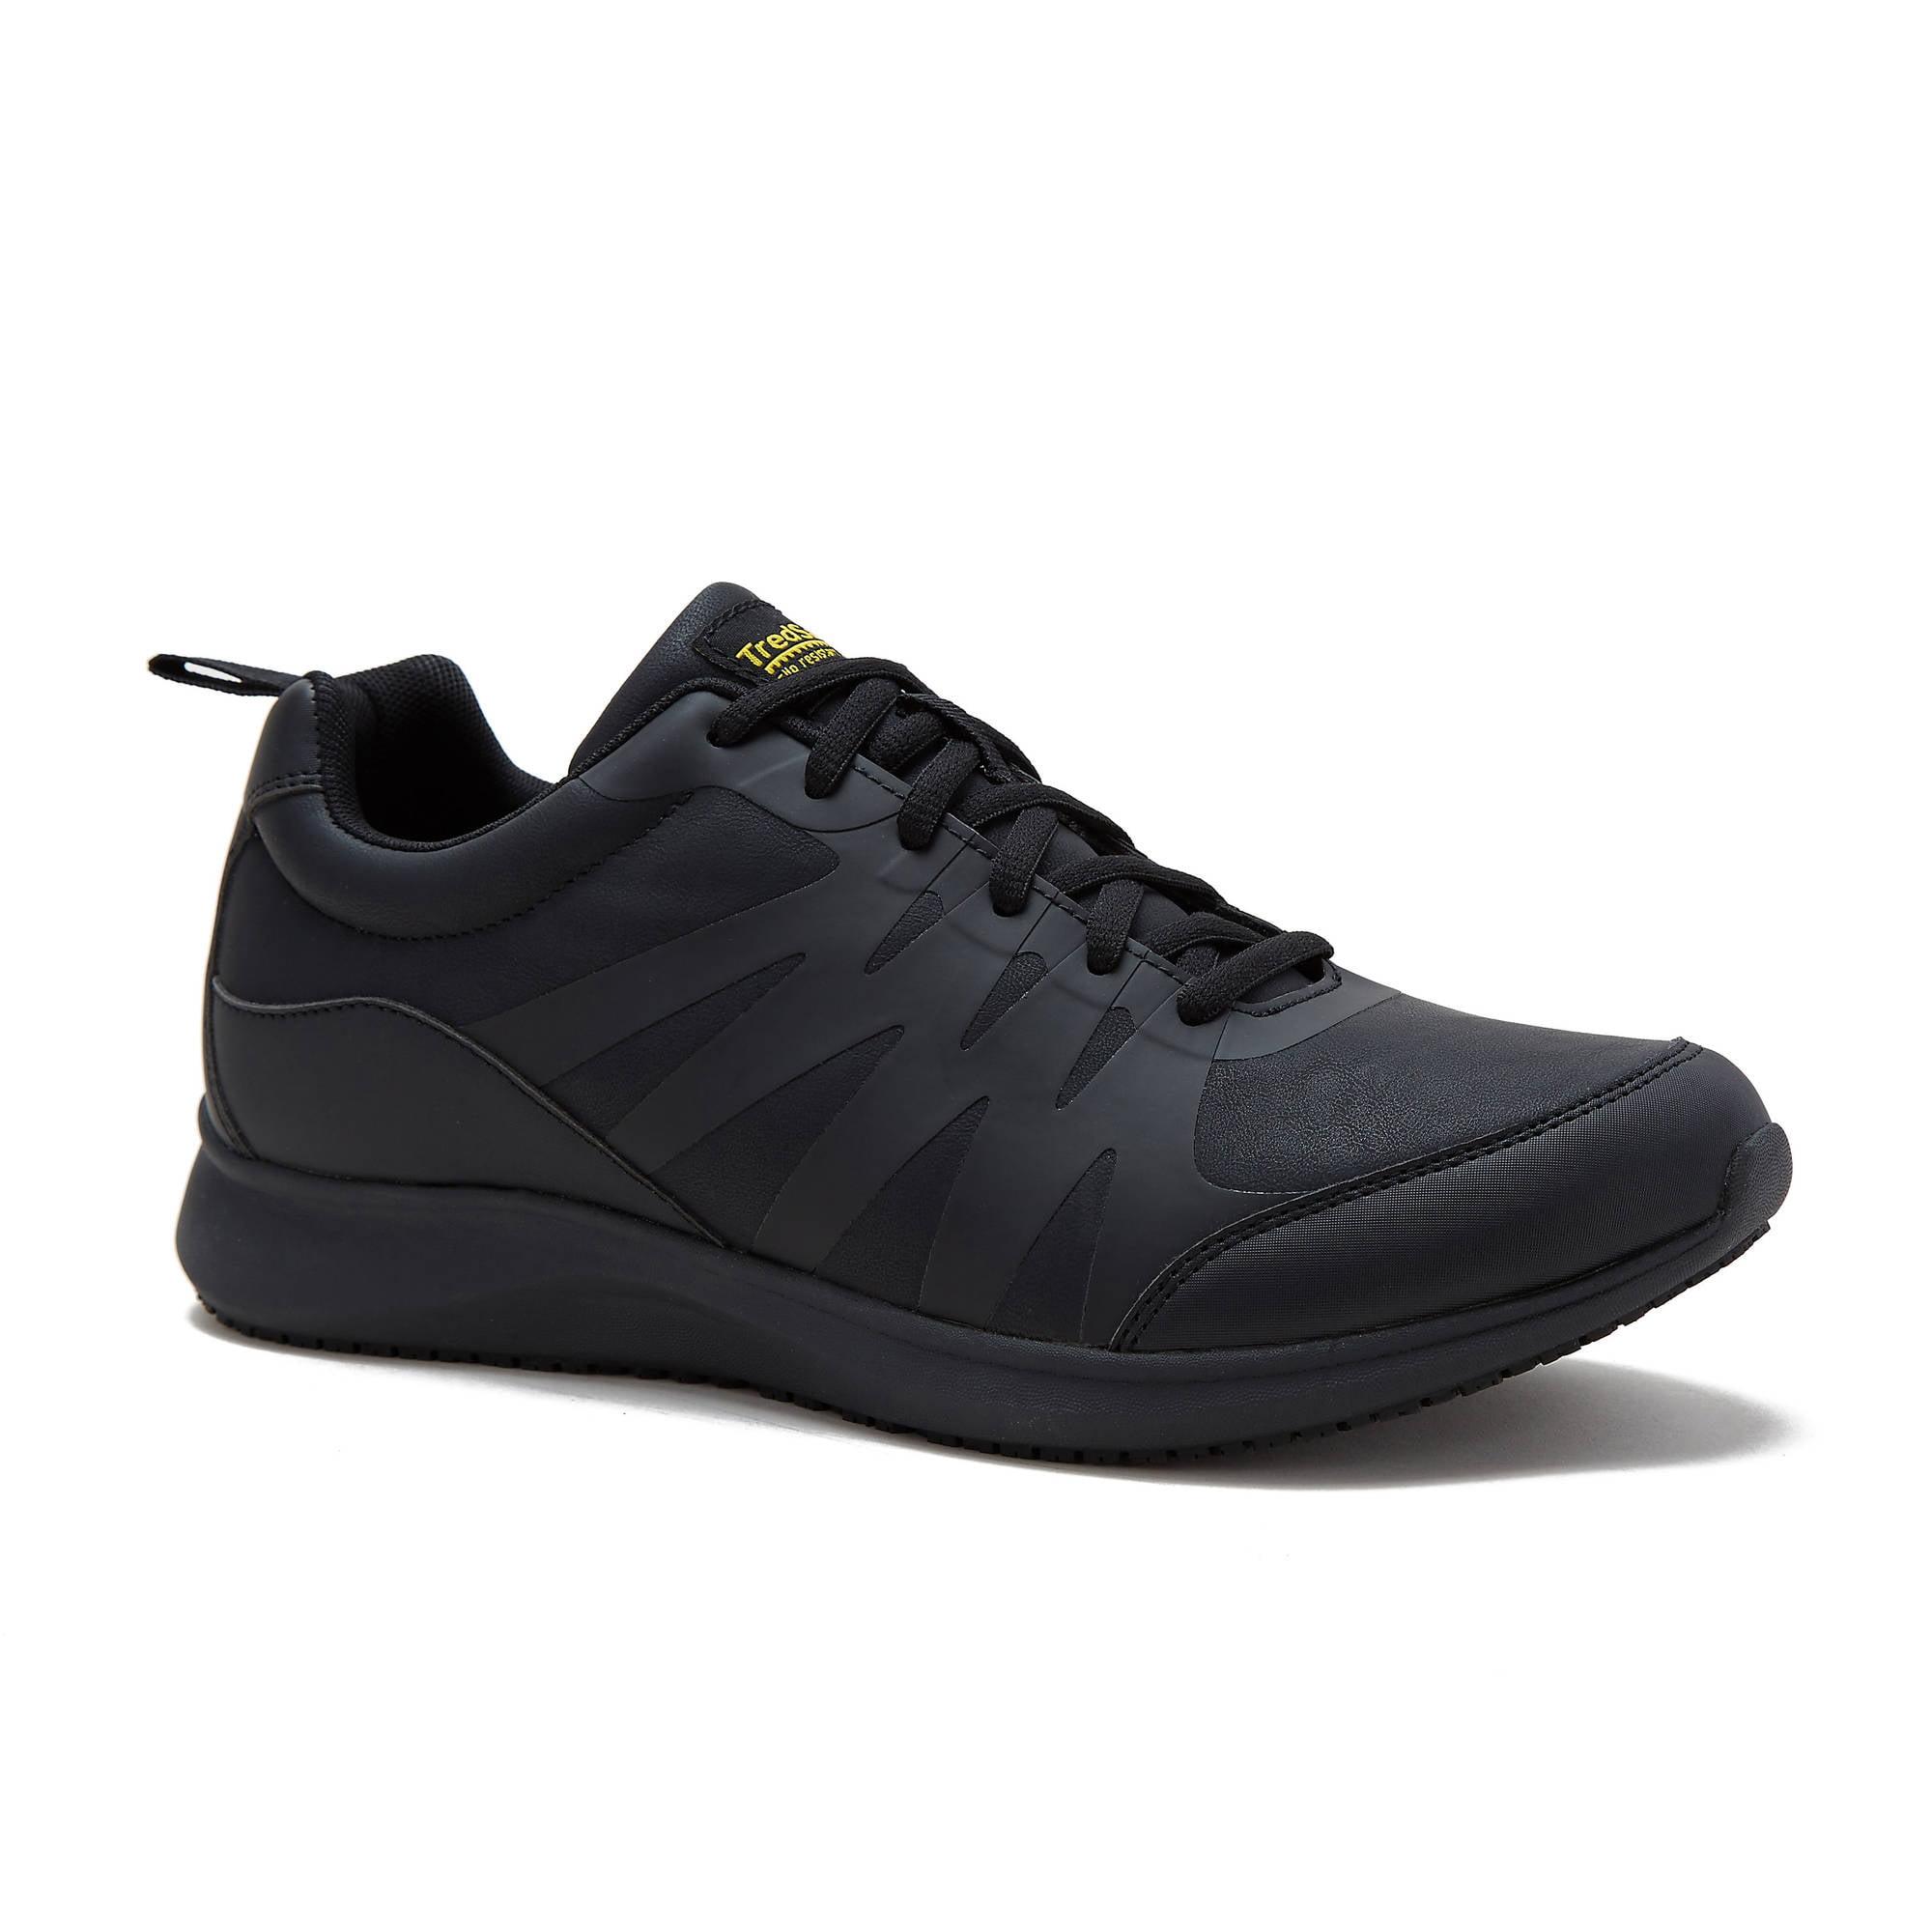 Tredsafe Men's Nitro Slip Resistant Shoe by ES Originals